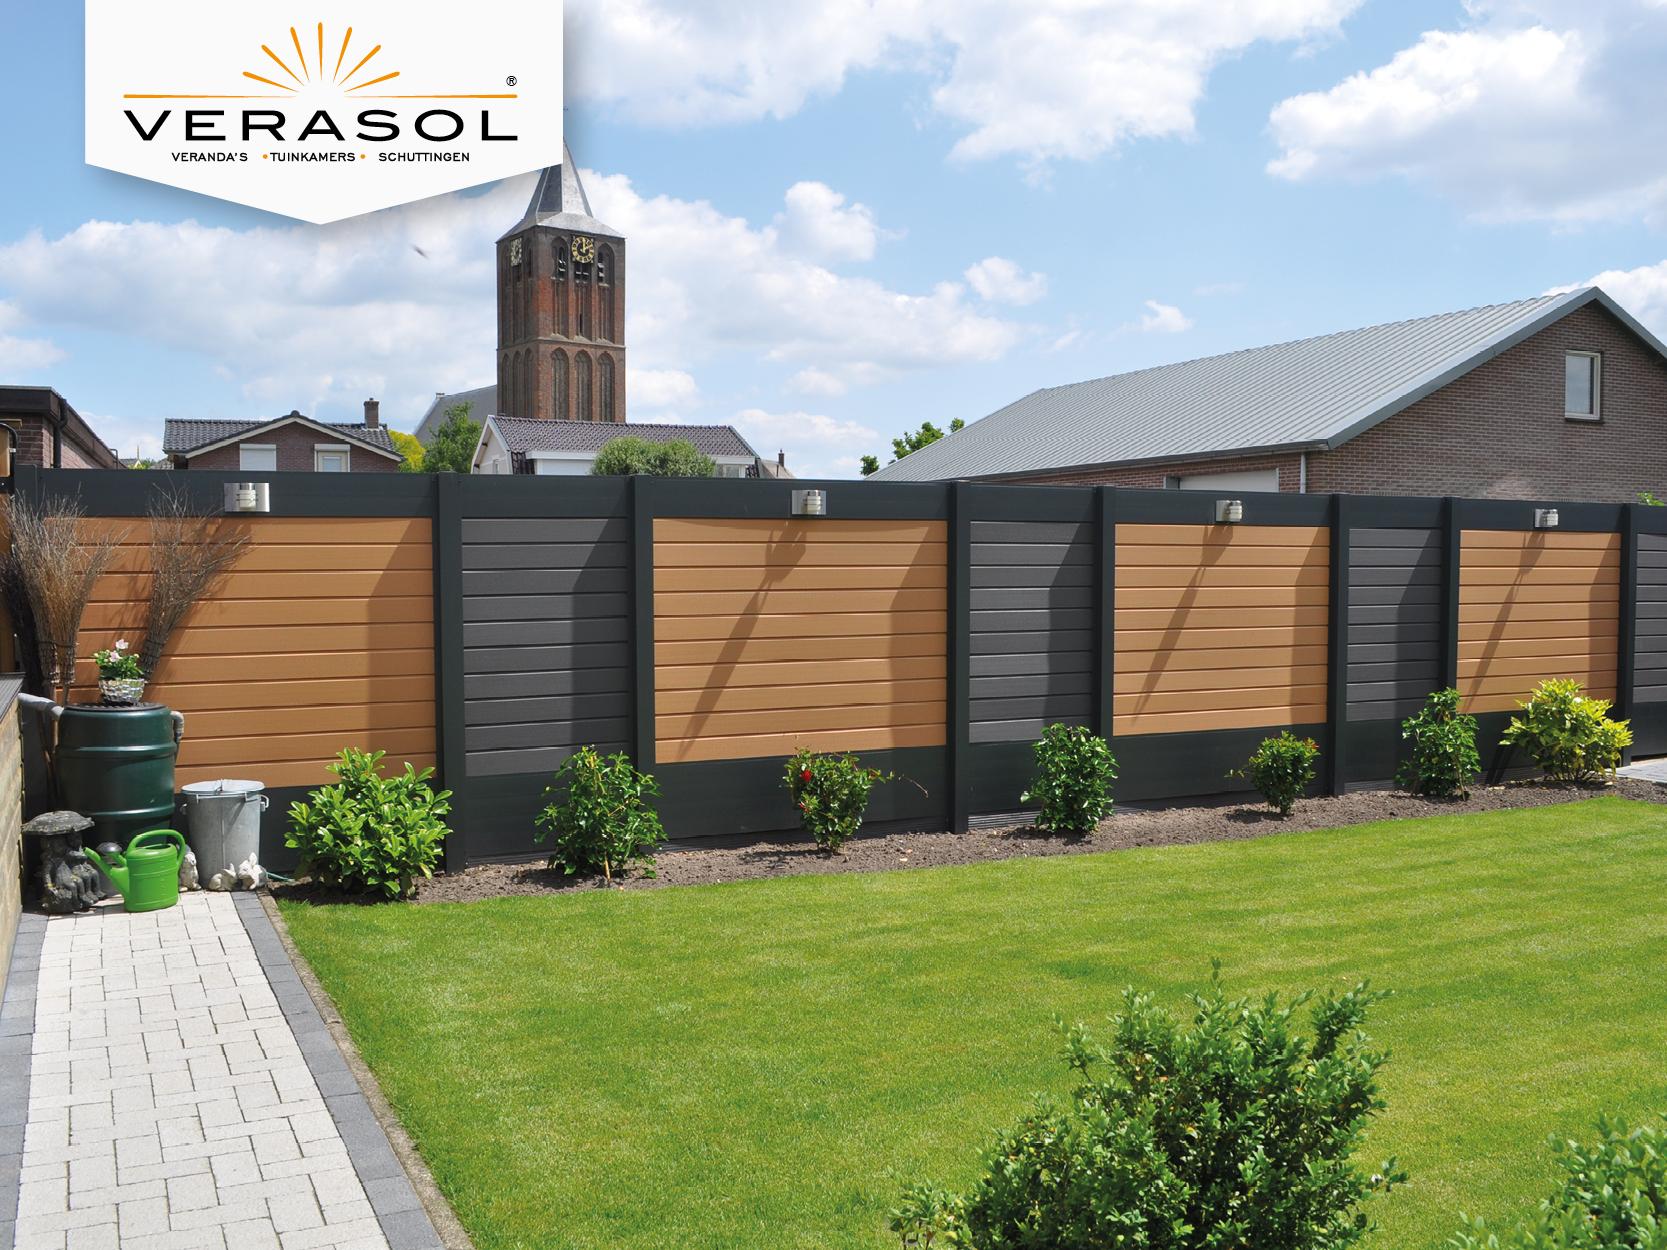 Photo of Verasol Fence Composite   Light brown